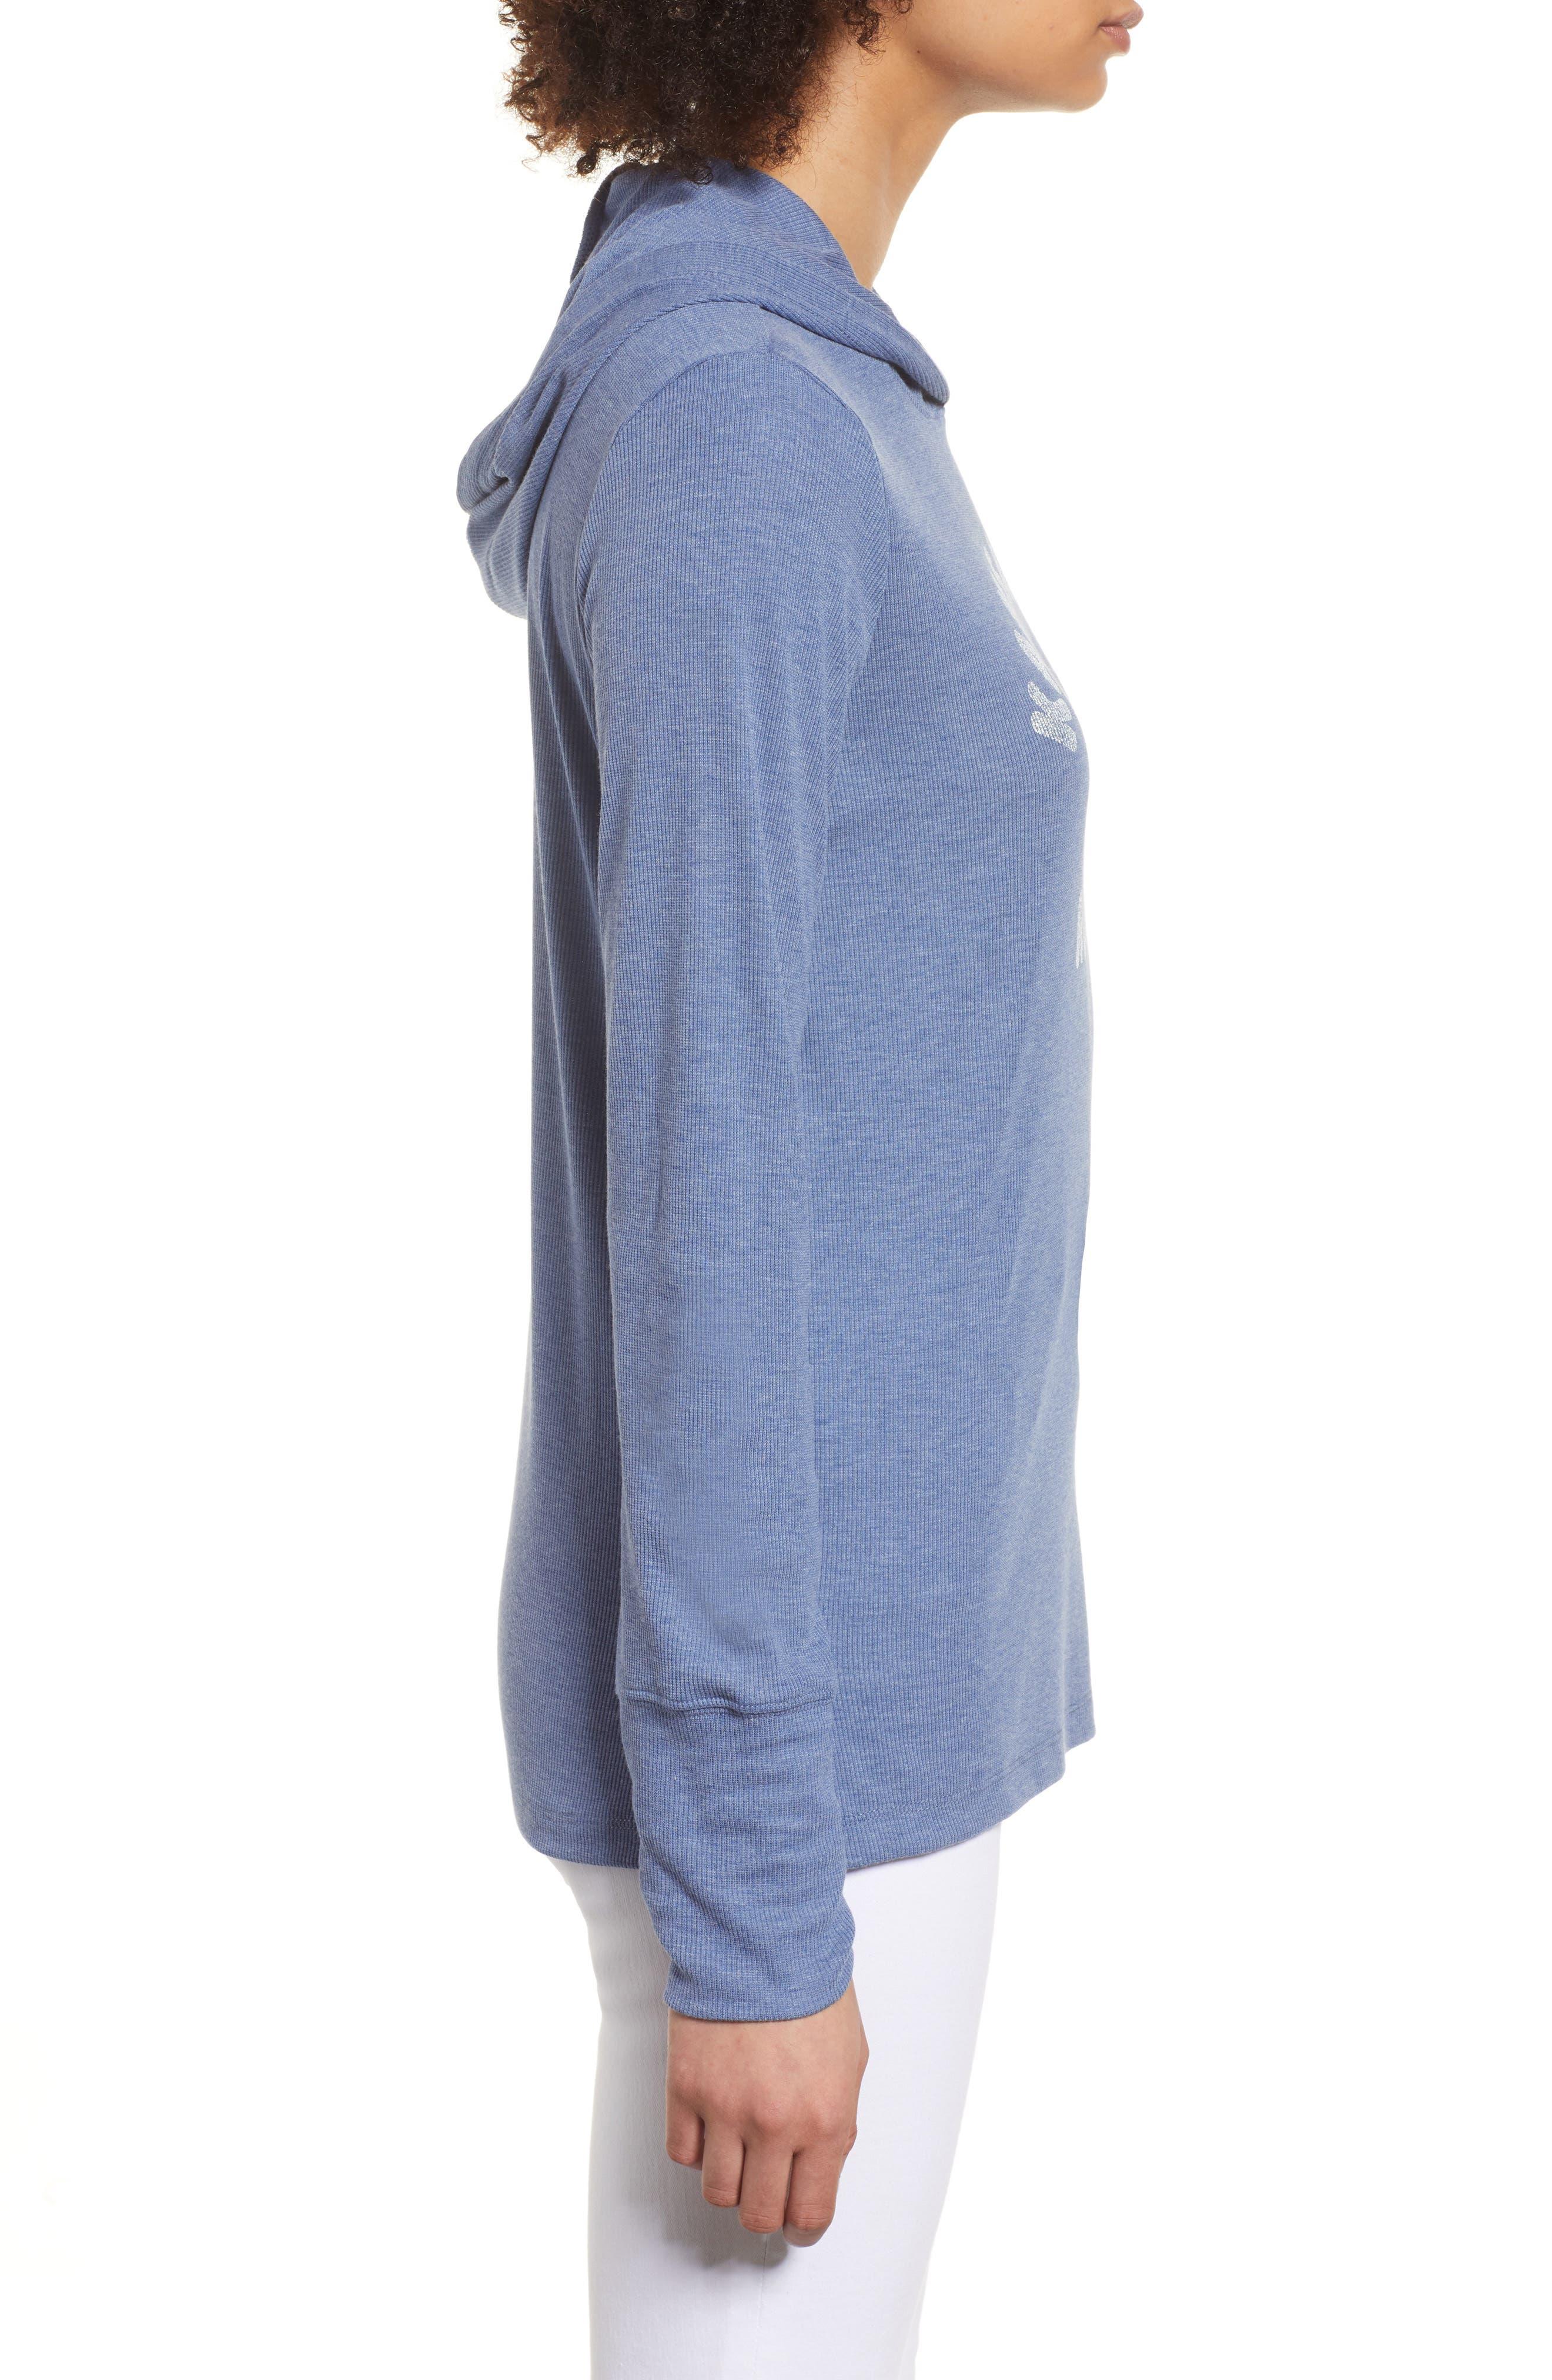 Campbell Kansas City Royals Rib Knit Hooded Top,                             Alternate thumbnail 3, color,                             Bleacher Blue